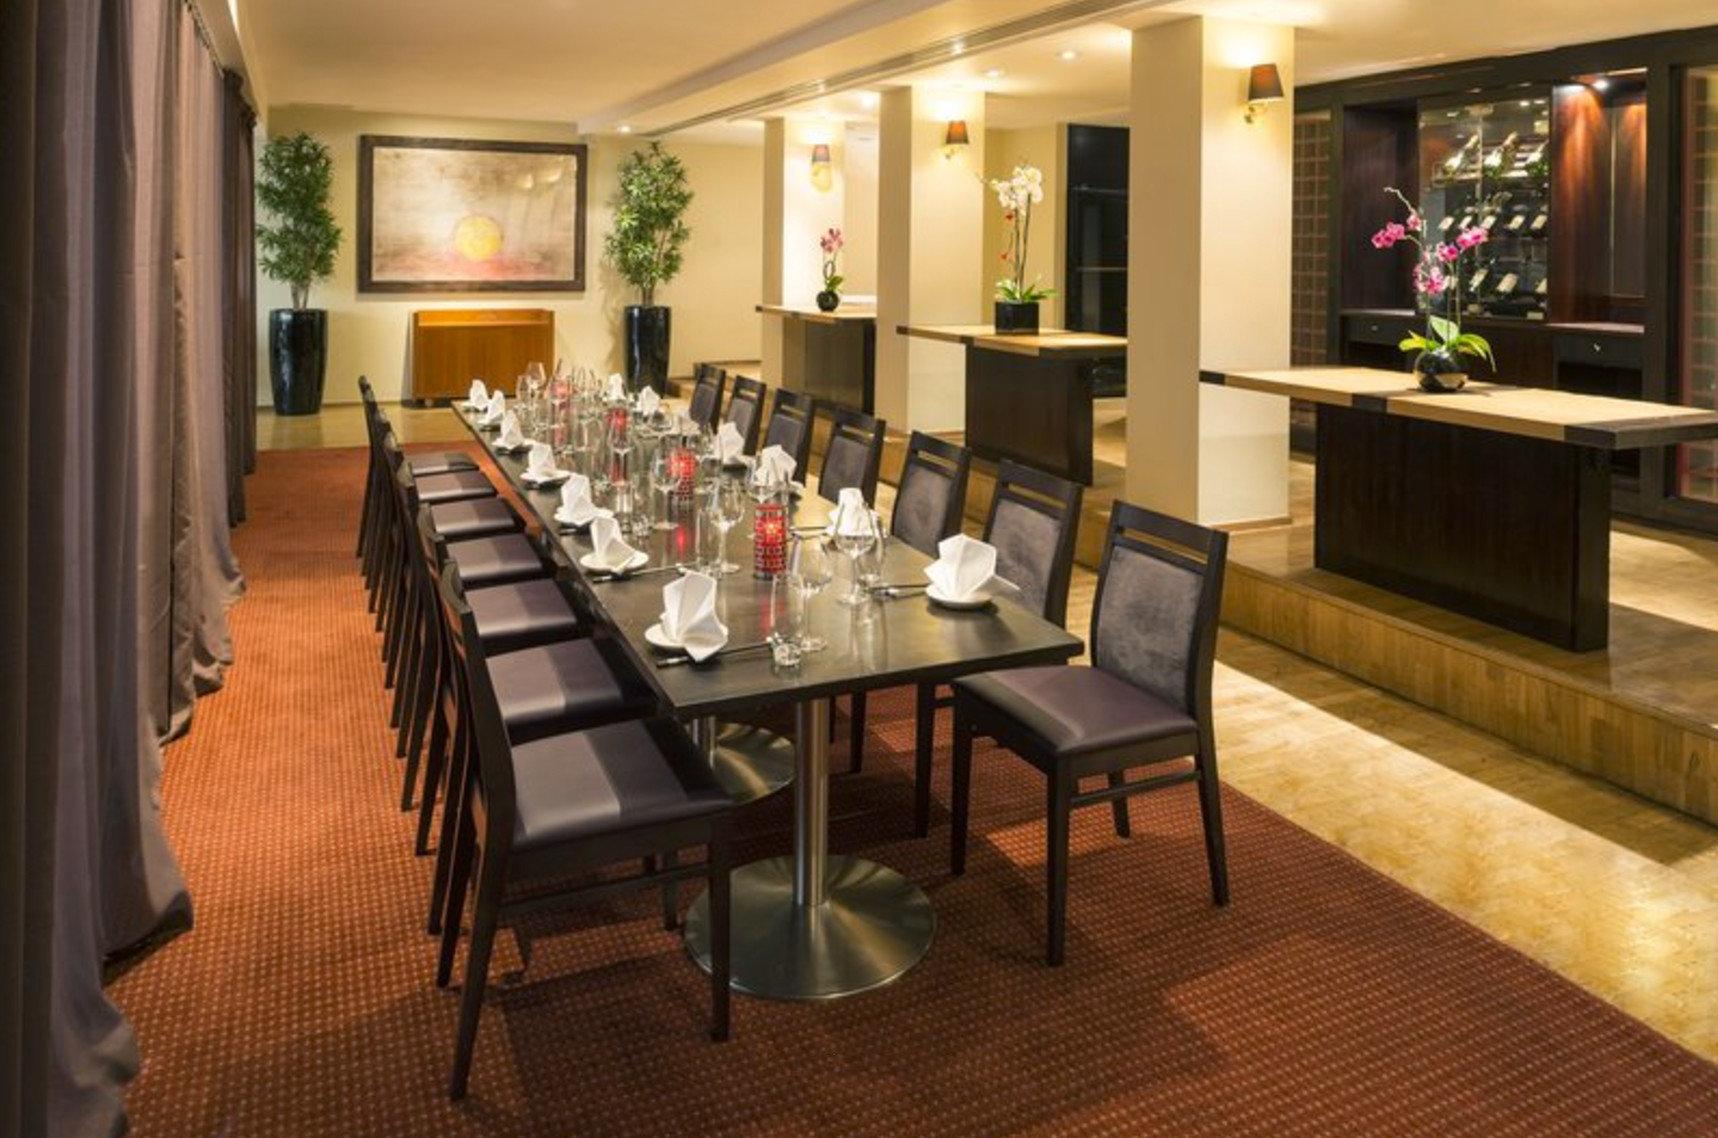 function hall restaurant Lobby ballroom Bar dining table